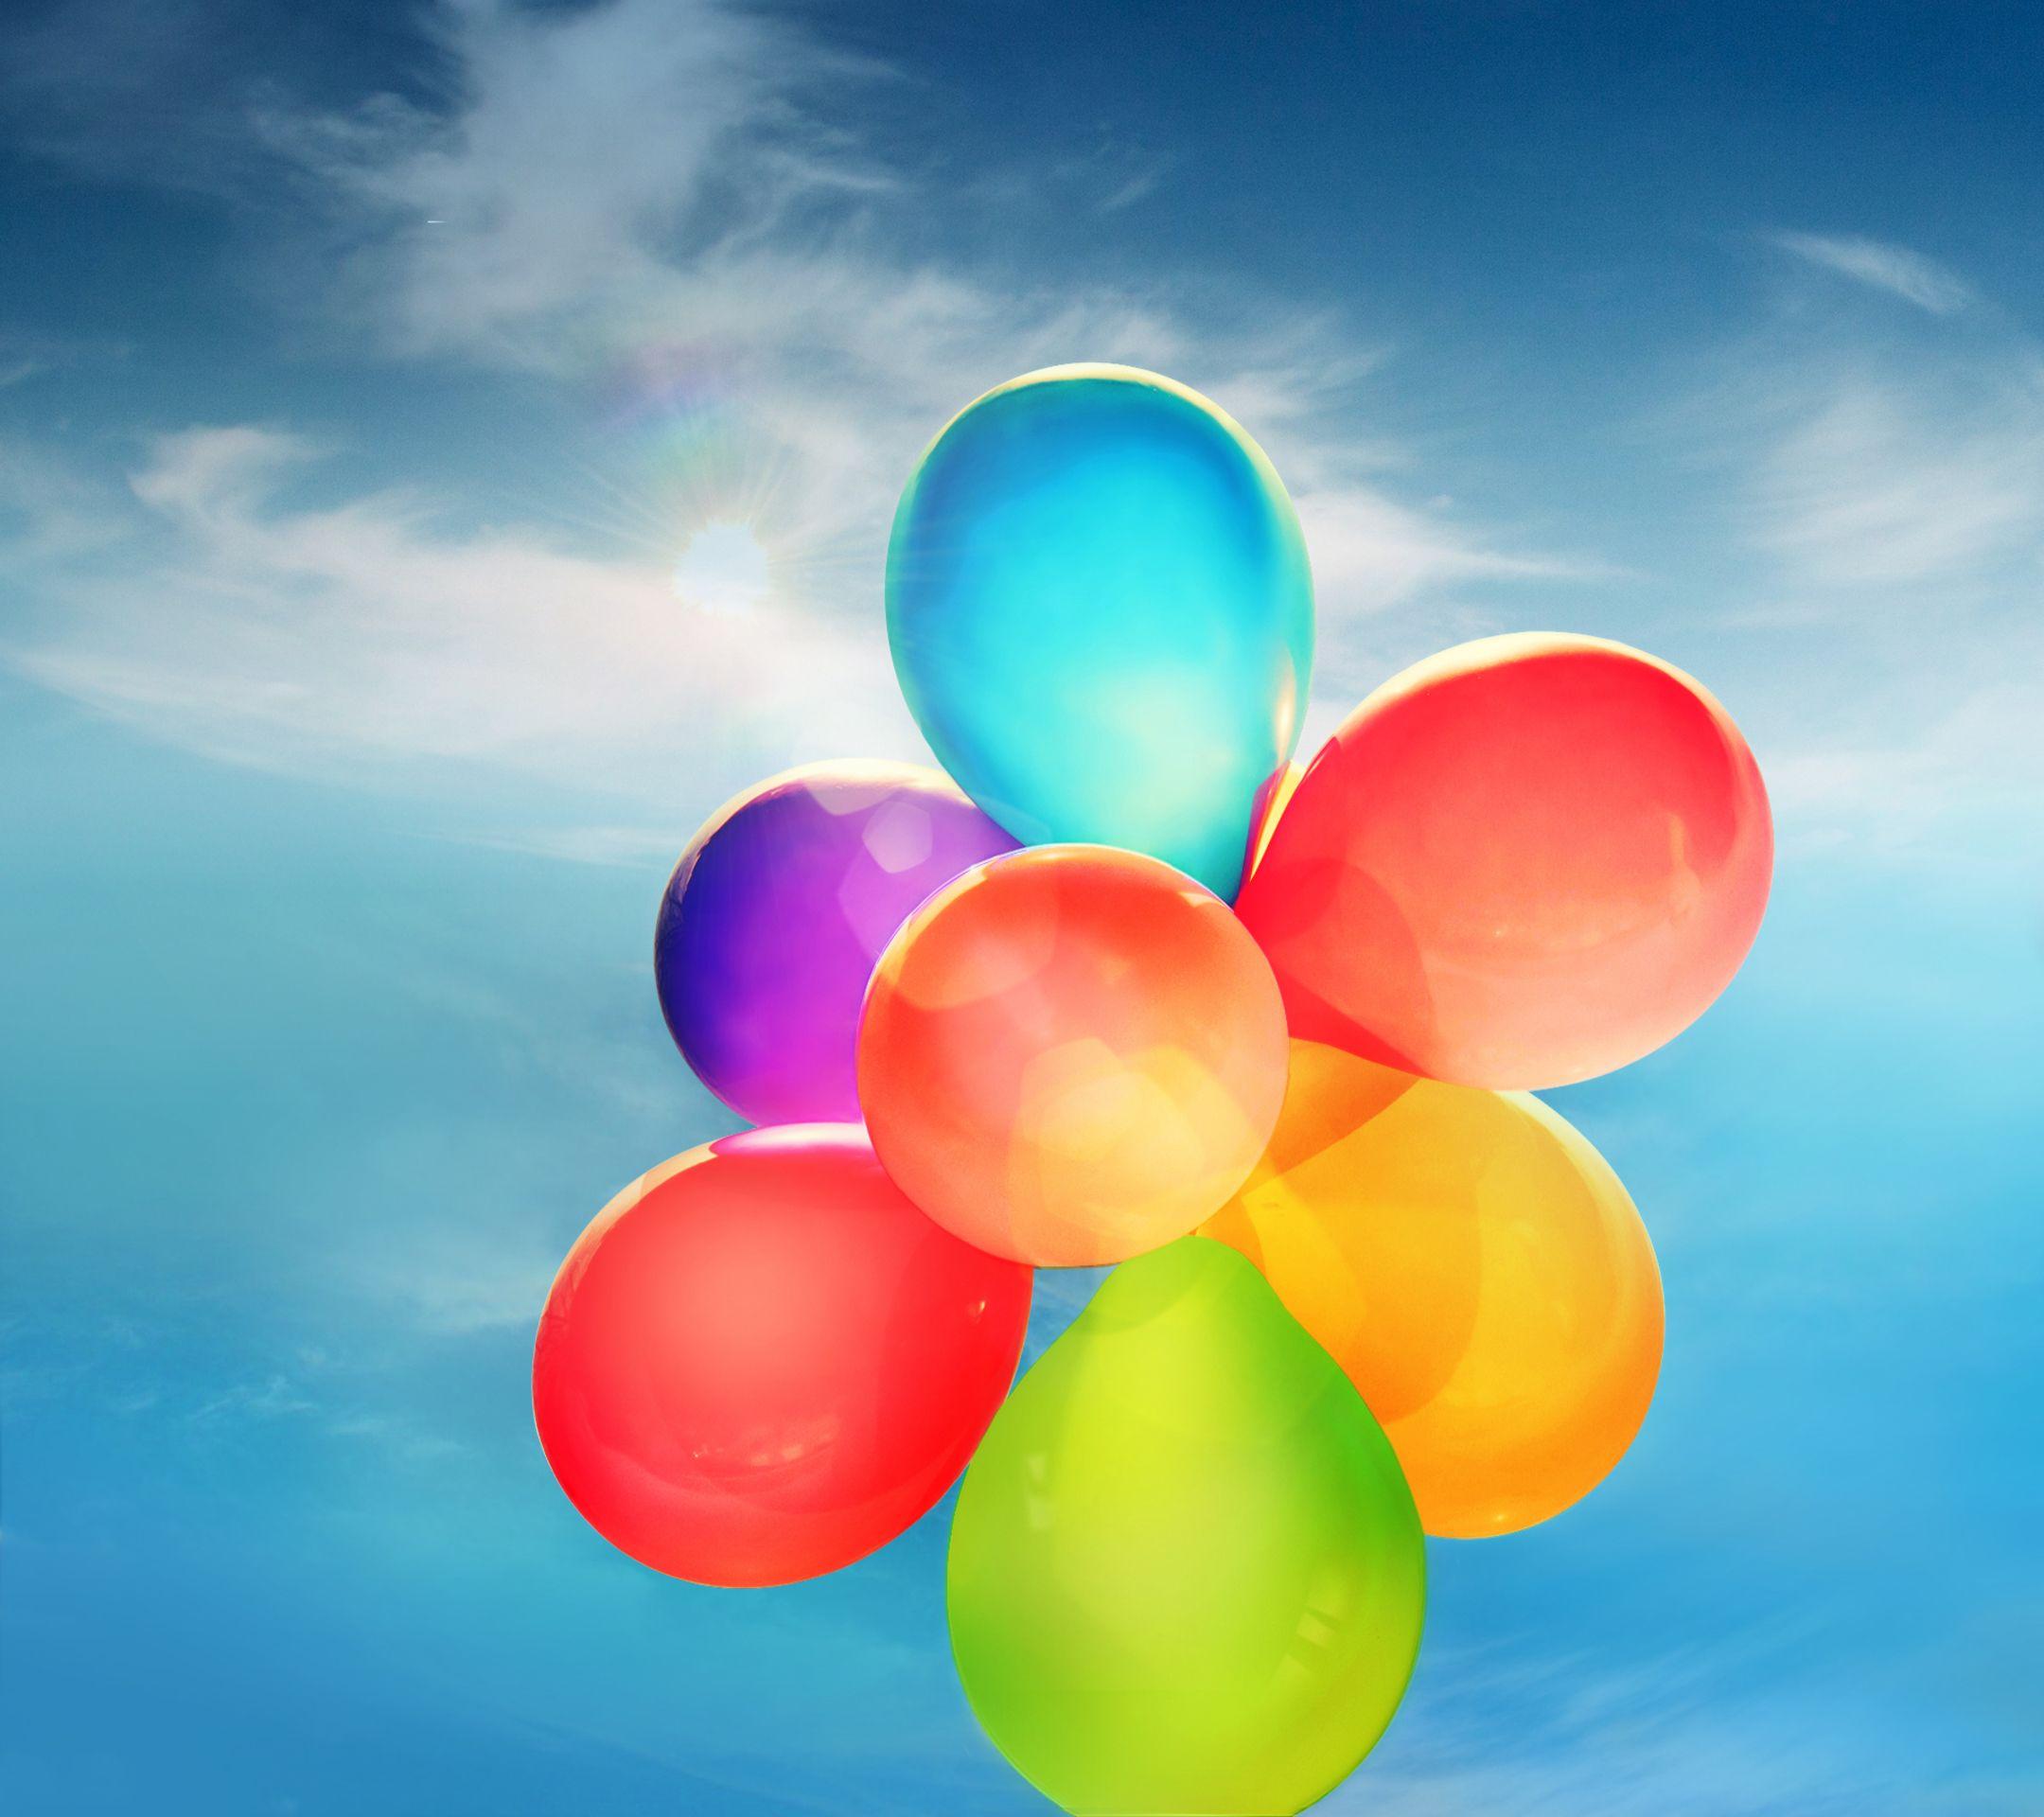 balloons wallpaper hd balloons wallpaper tumblr | balloons | pinterest